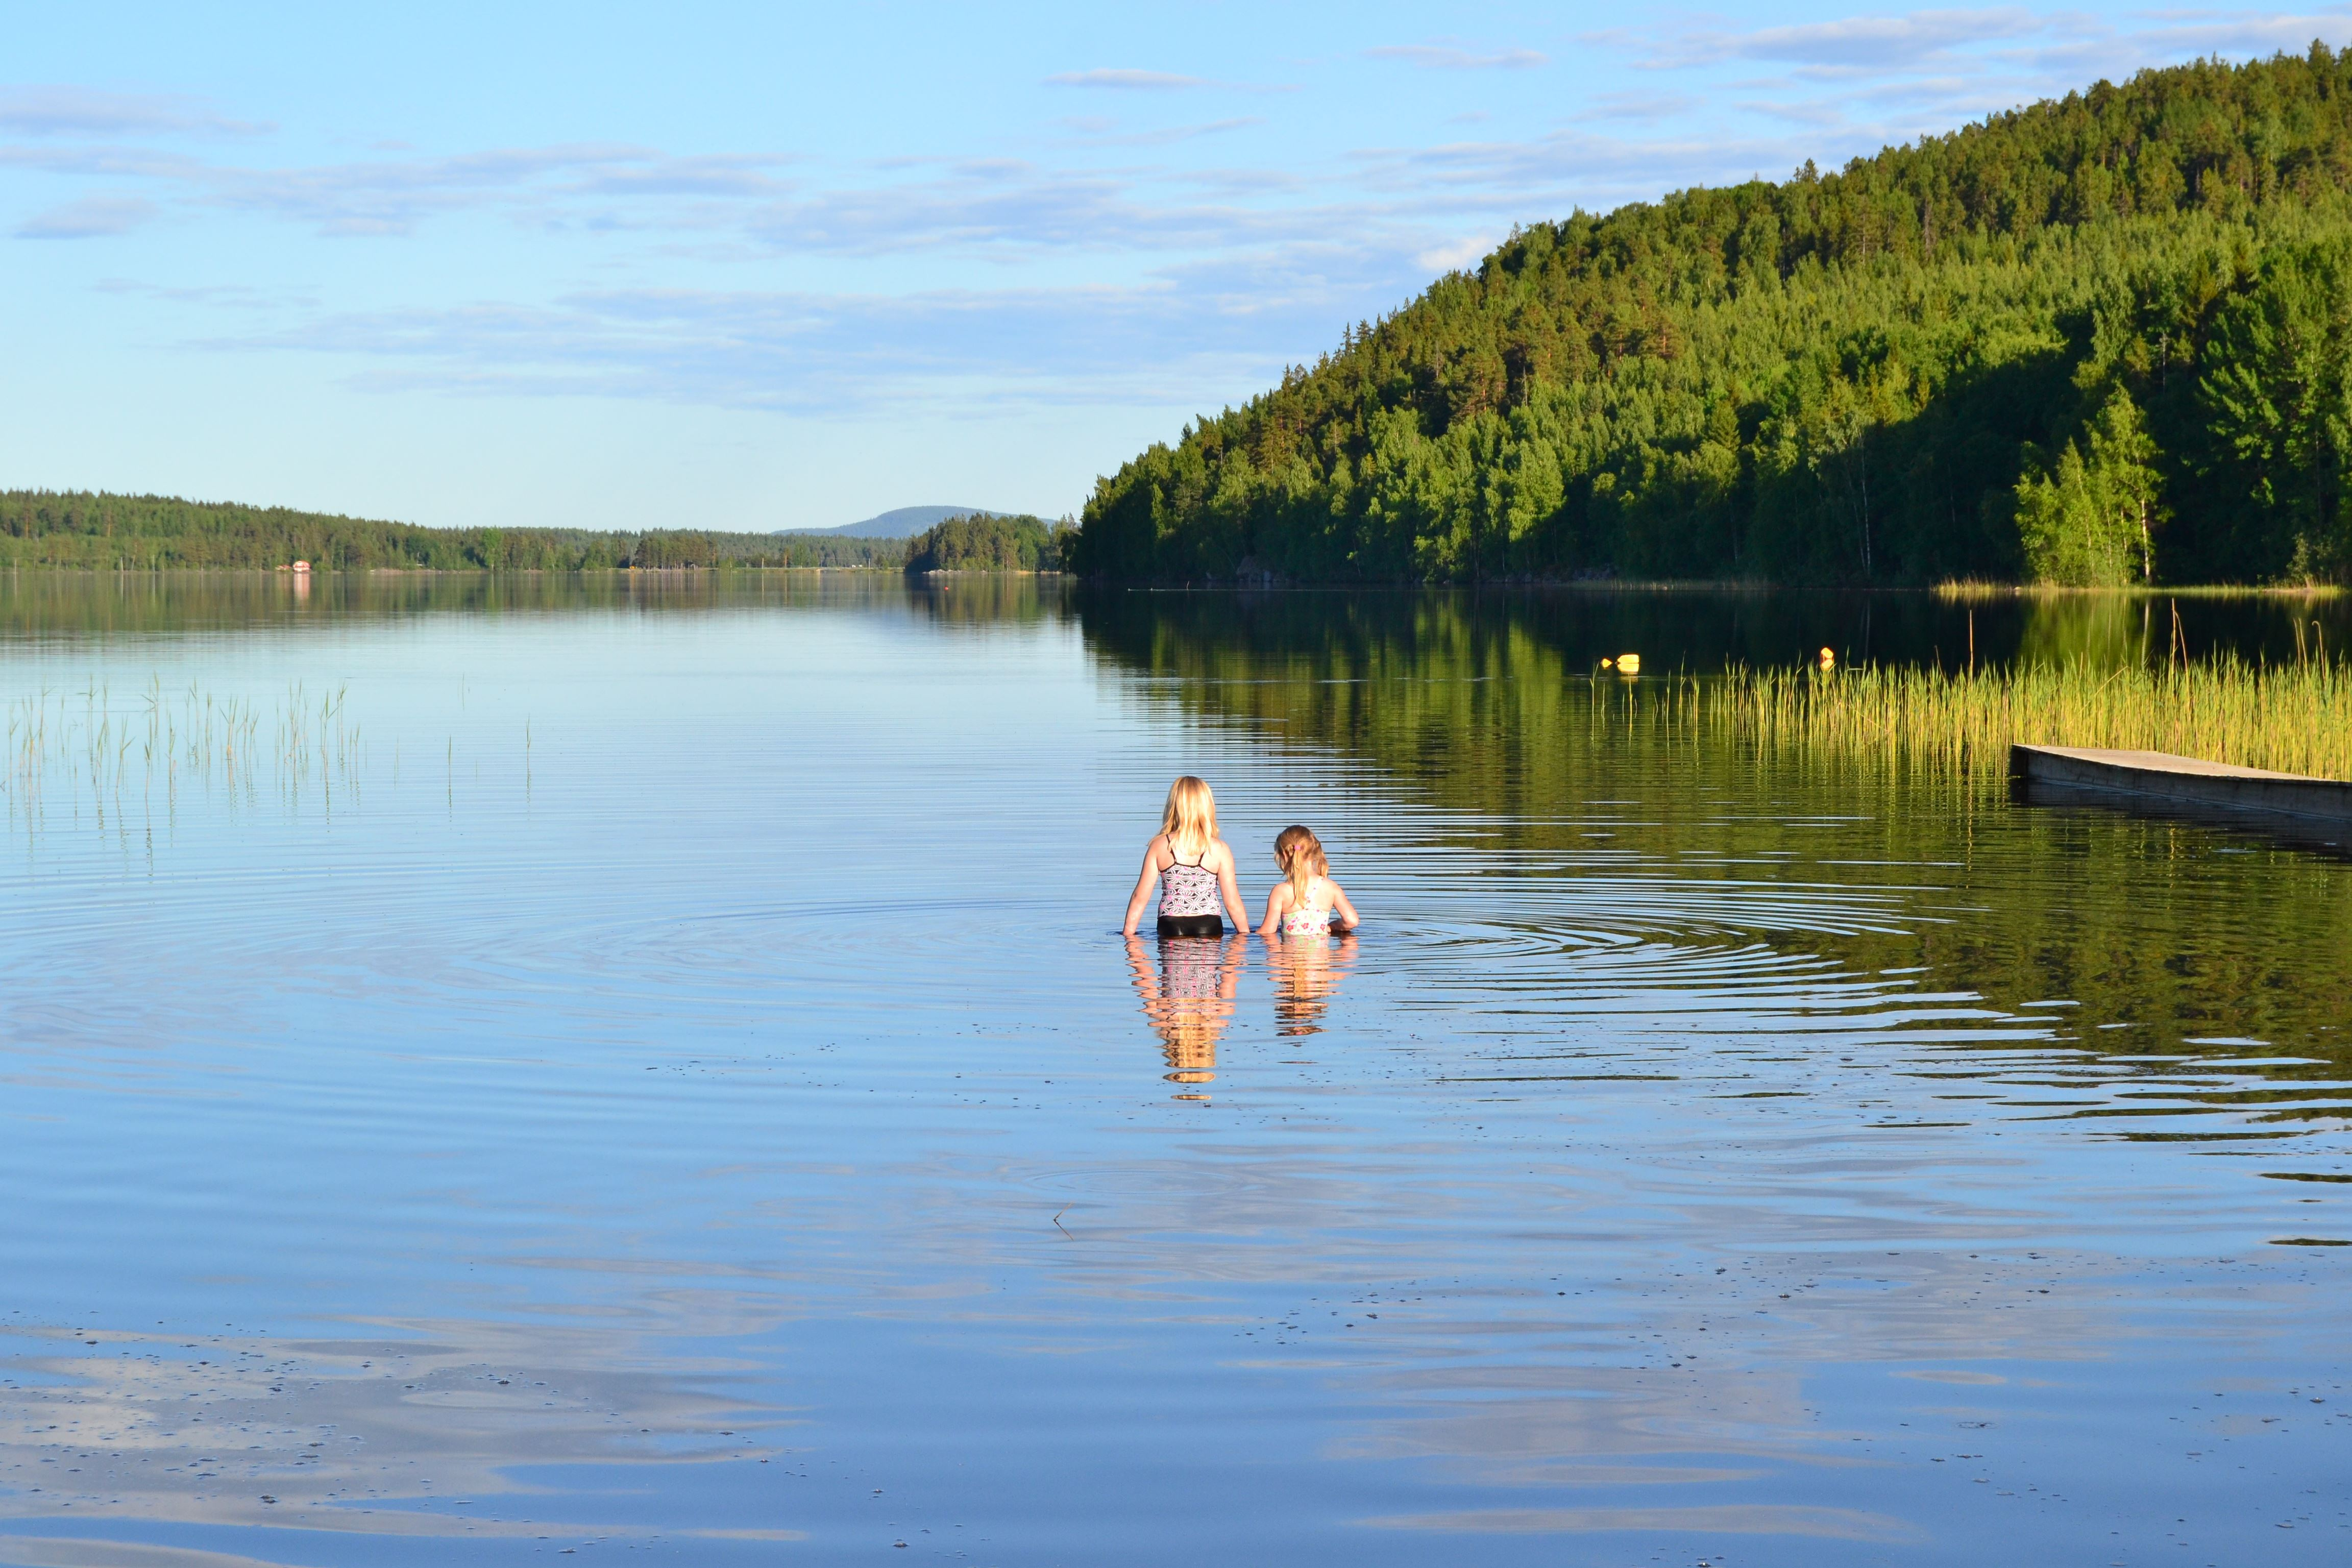 Skajet badplats i Hertsjö